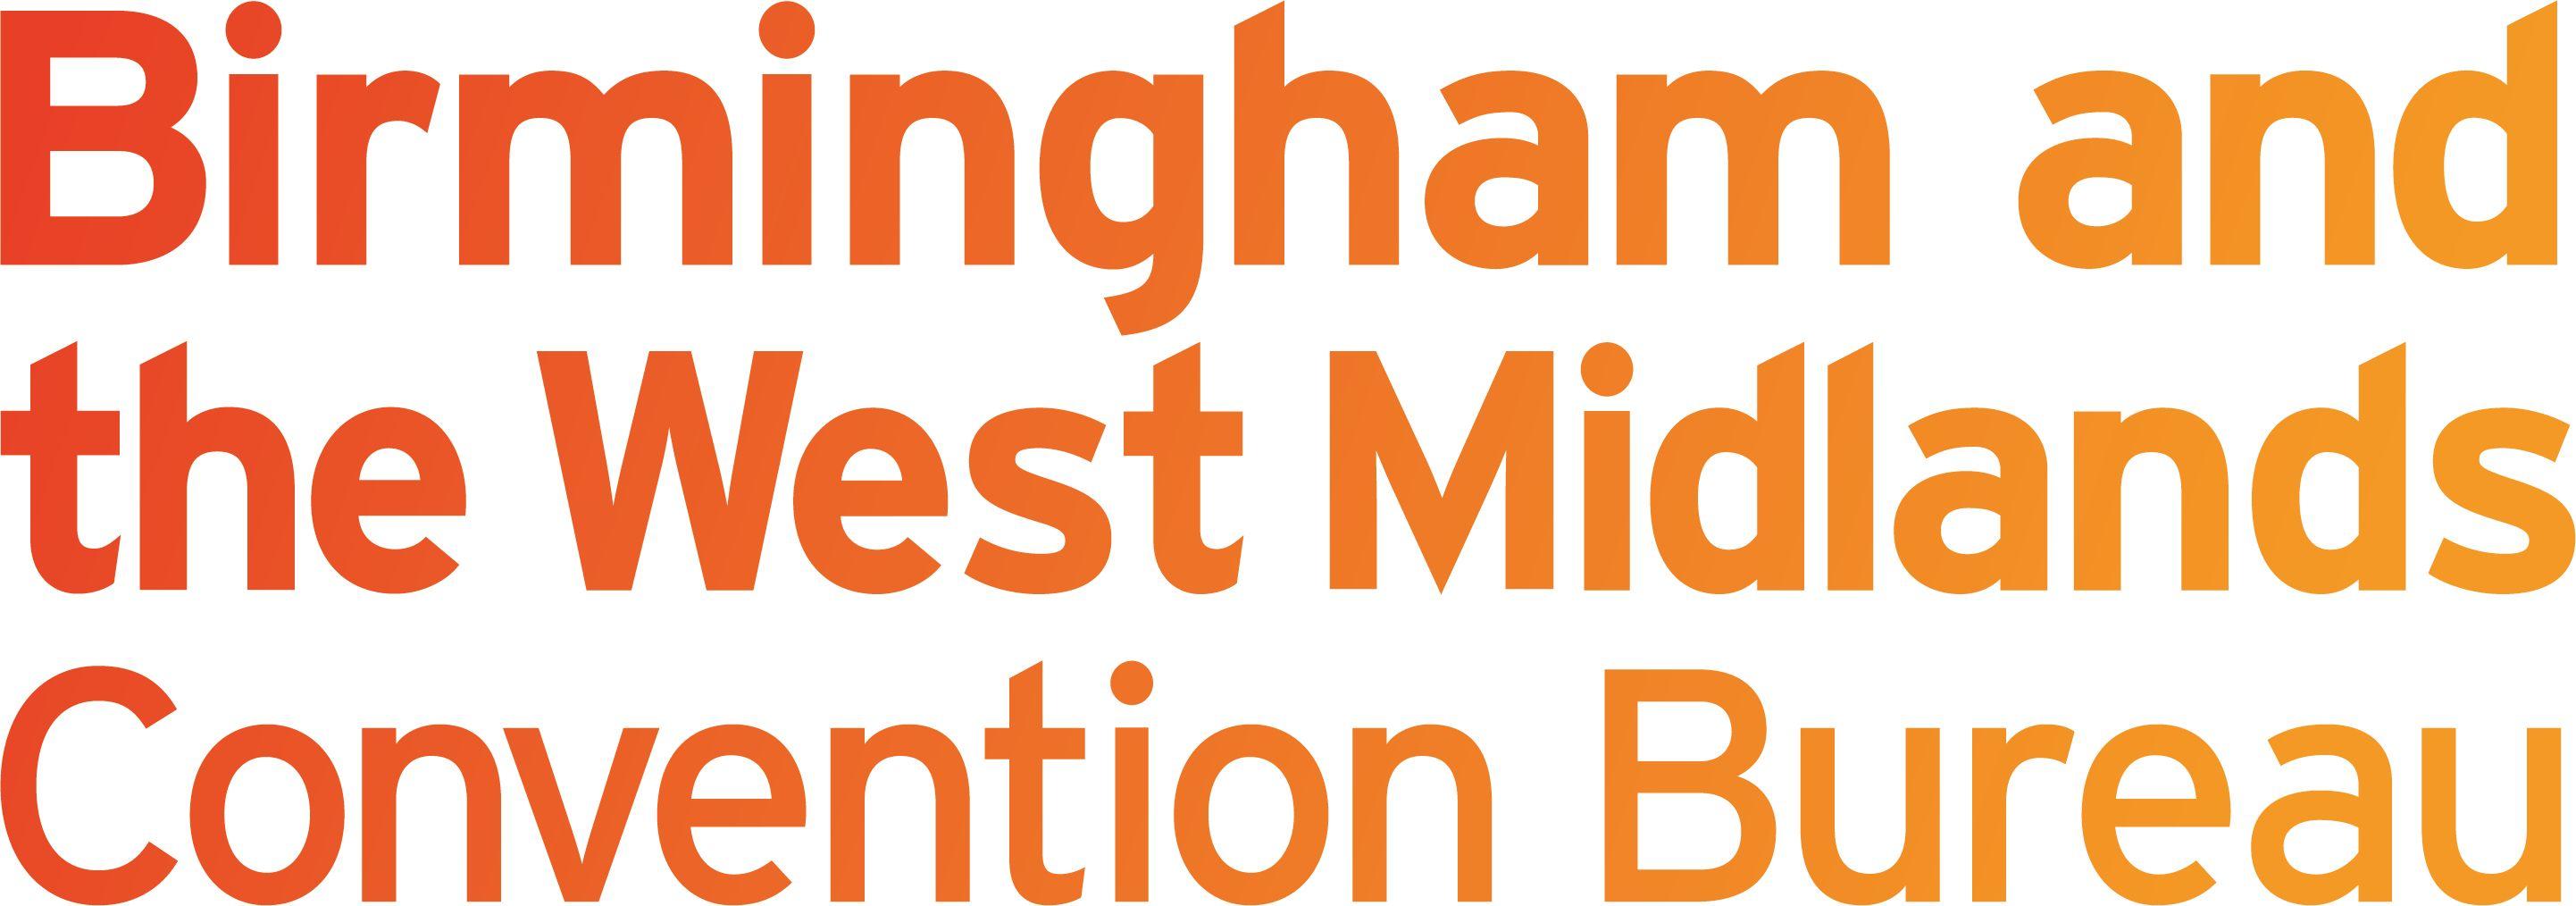 Birmingham and West Midlands Convention Bureau